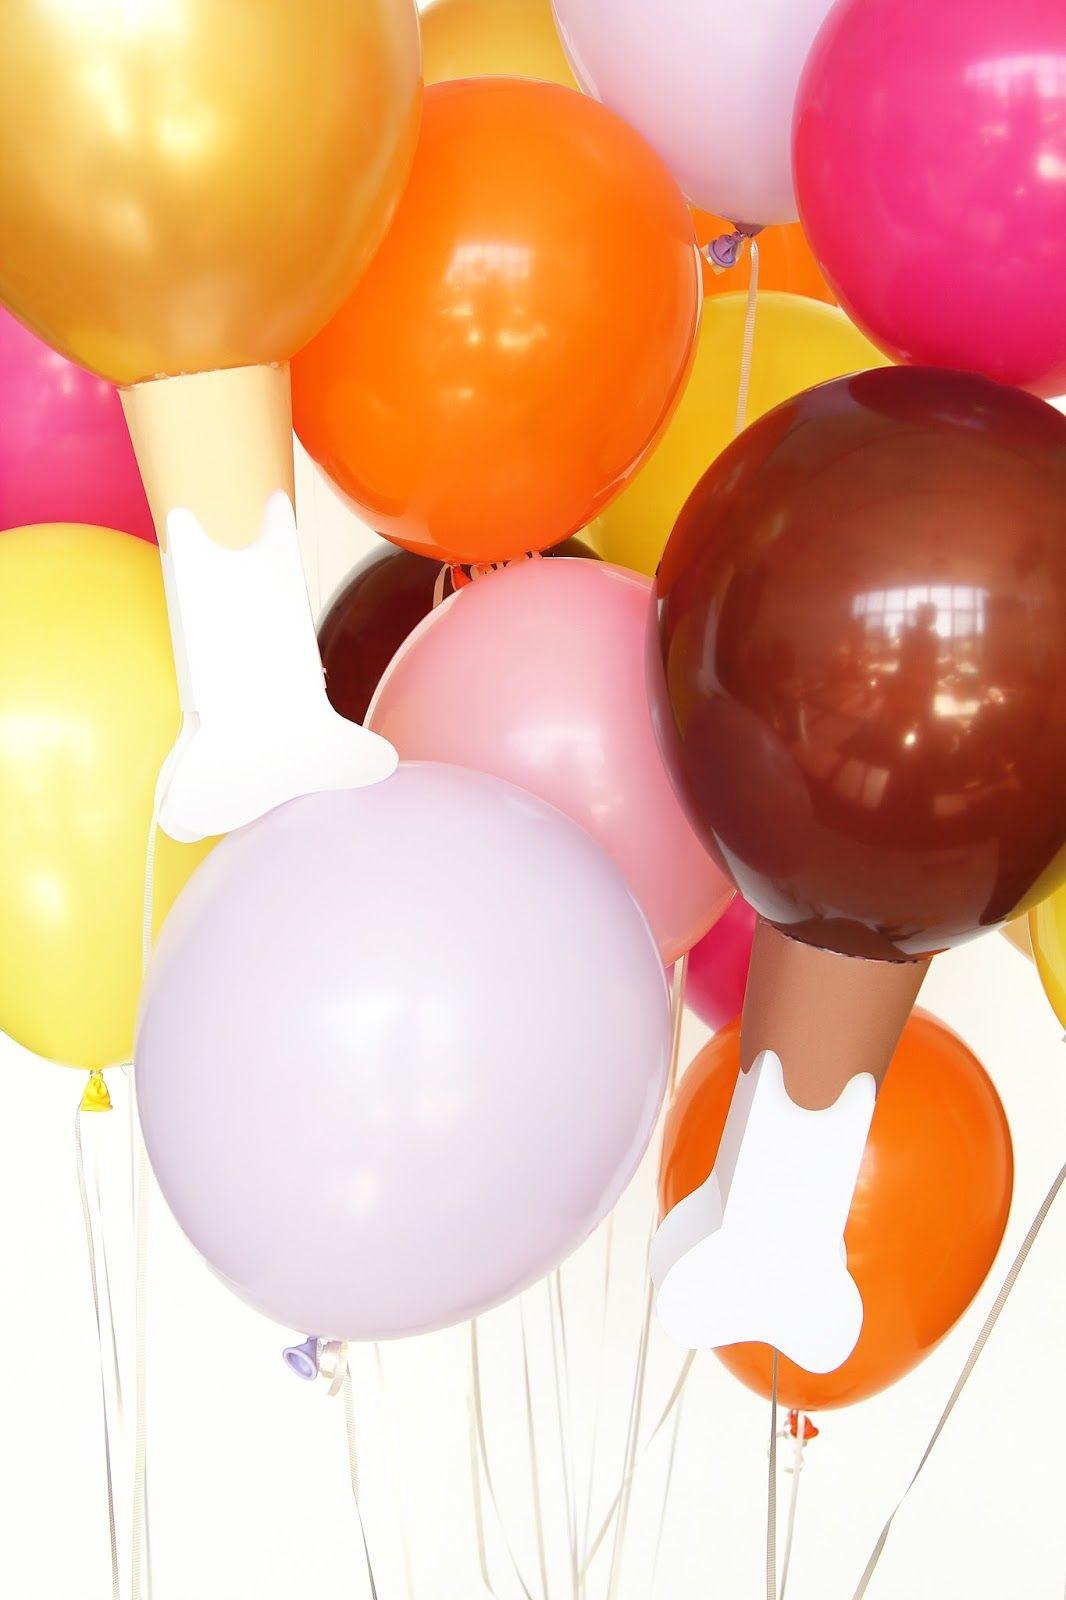 Aww Sam Diy Emoji Turkey Leg Balloons For Thanksgiving Party